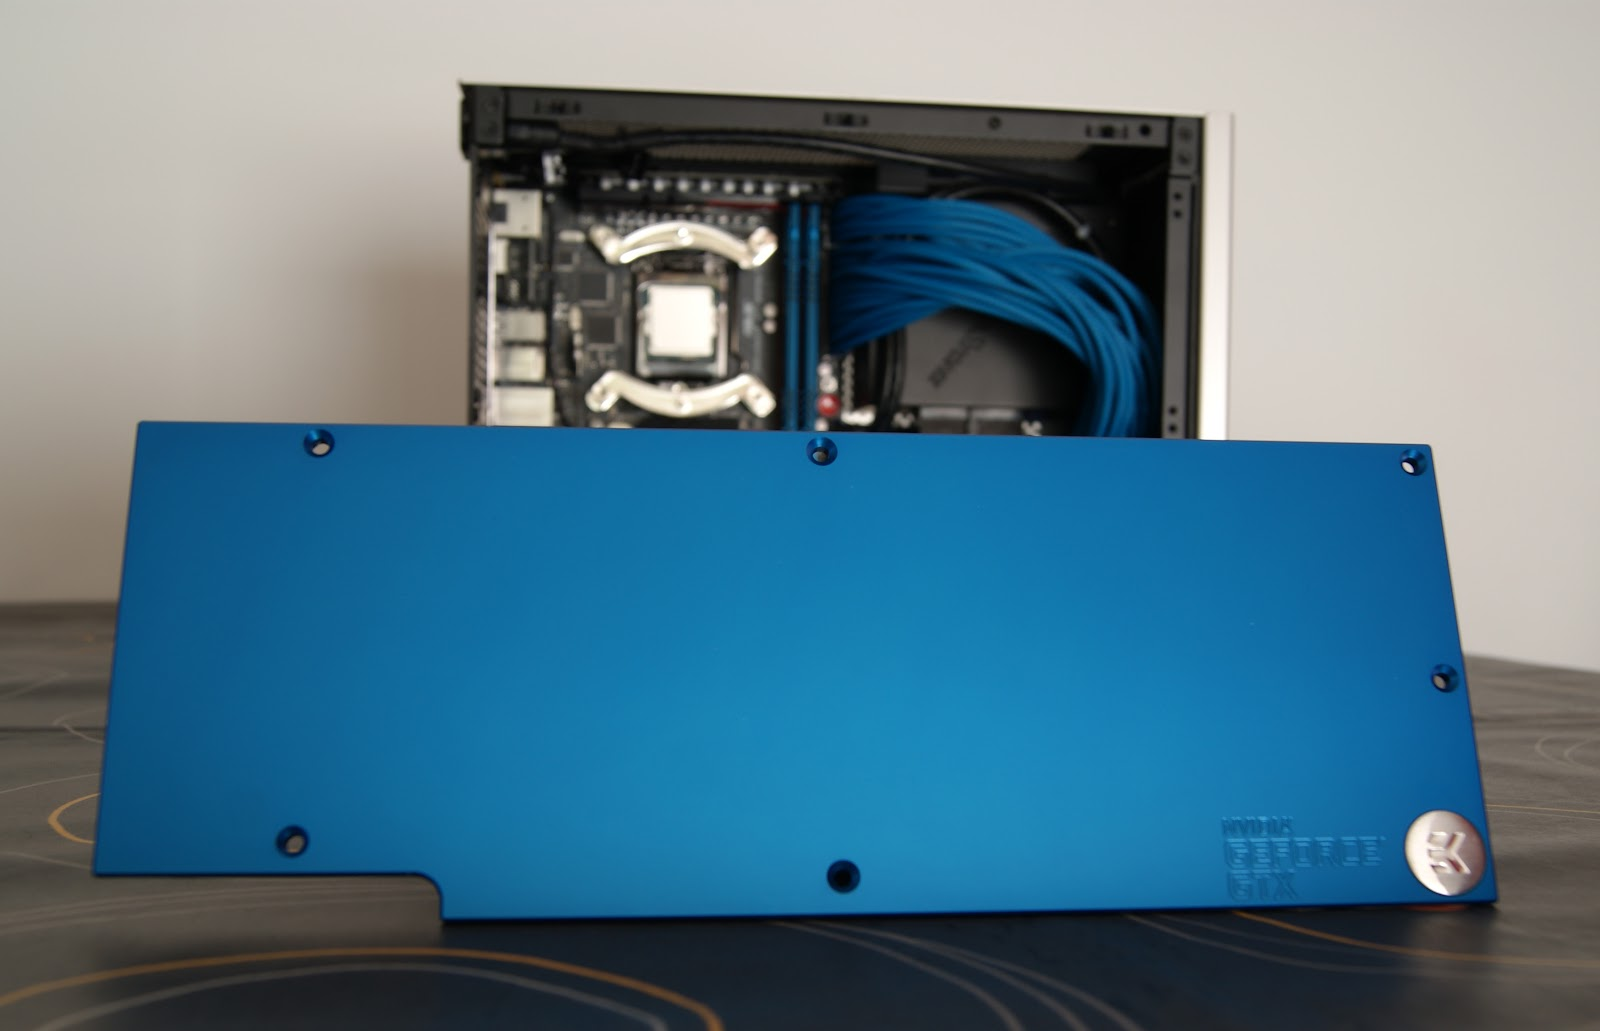 EK-FC780 GTX Backplate blue - Minimax3 by dPunisher